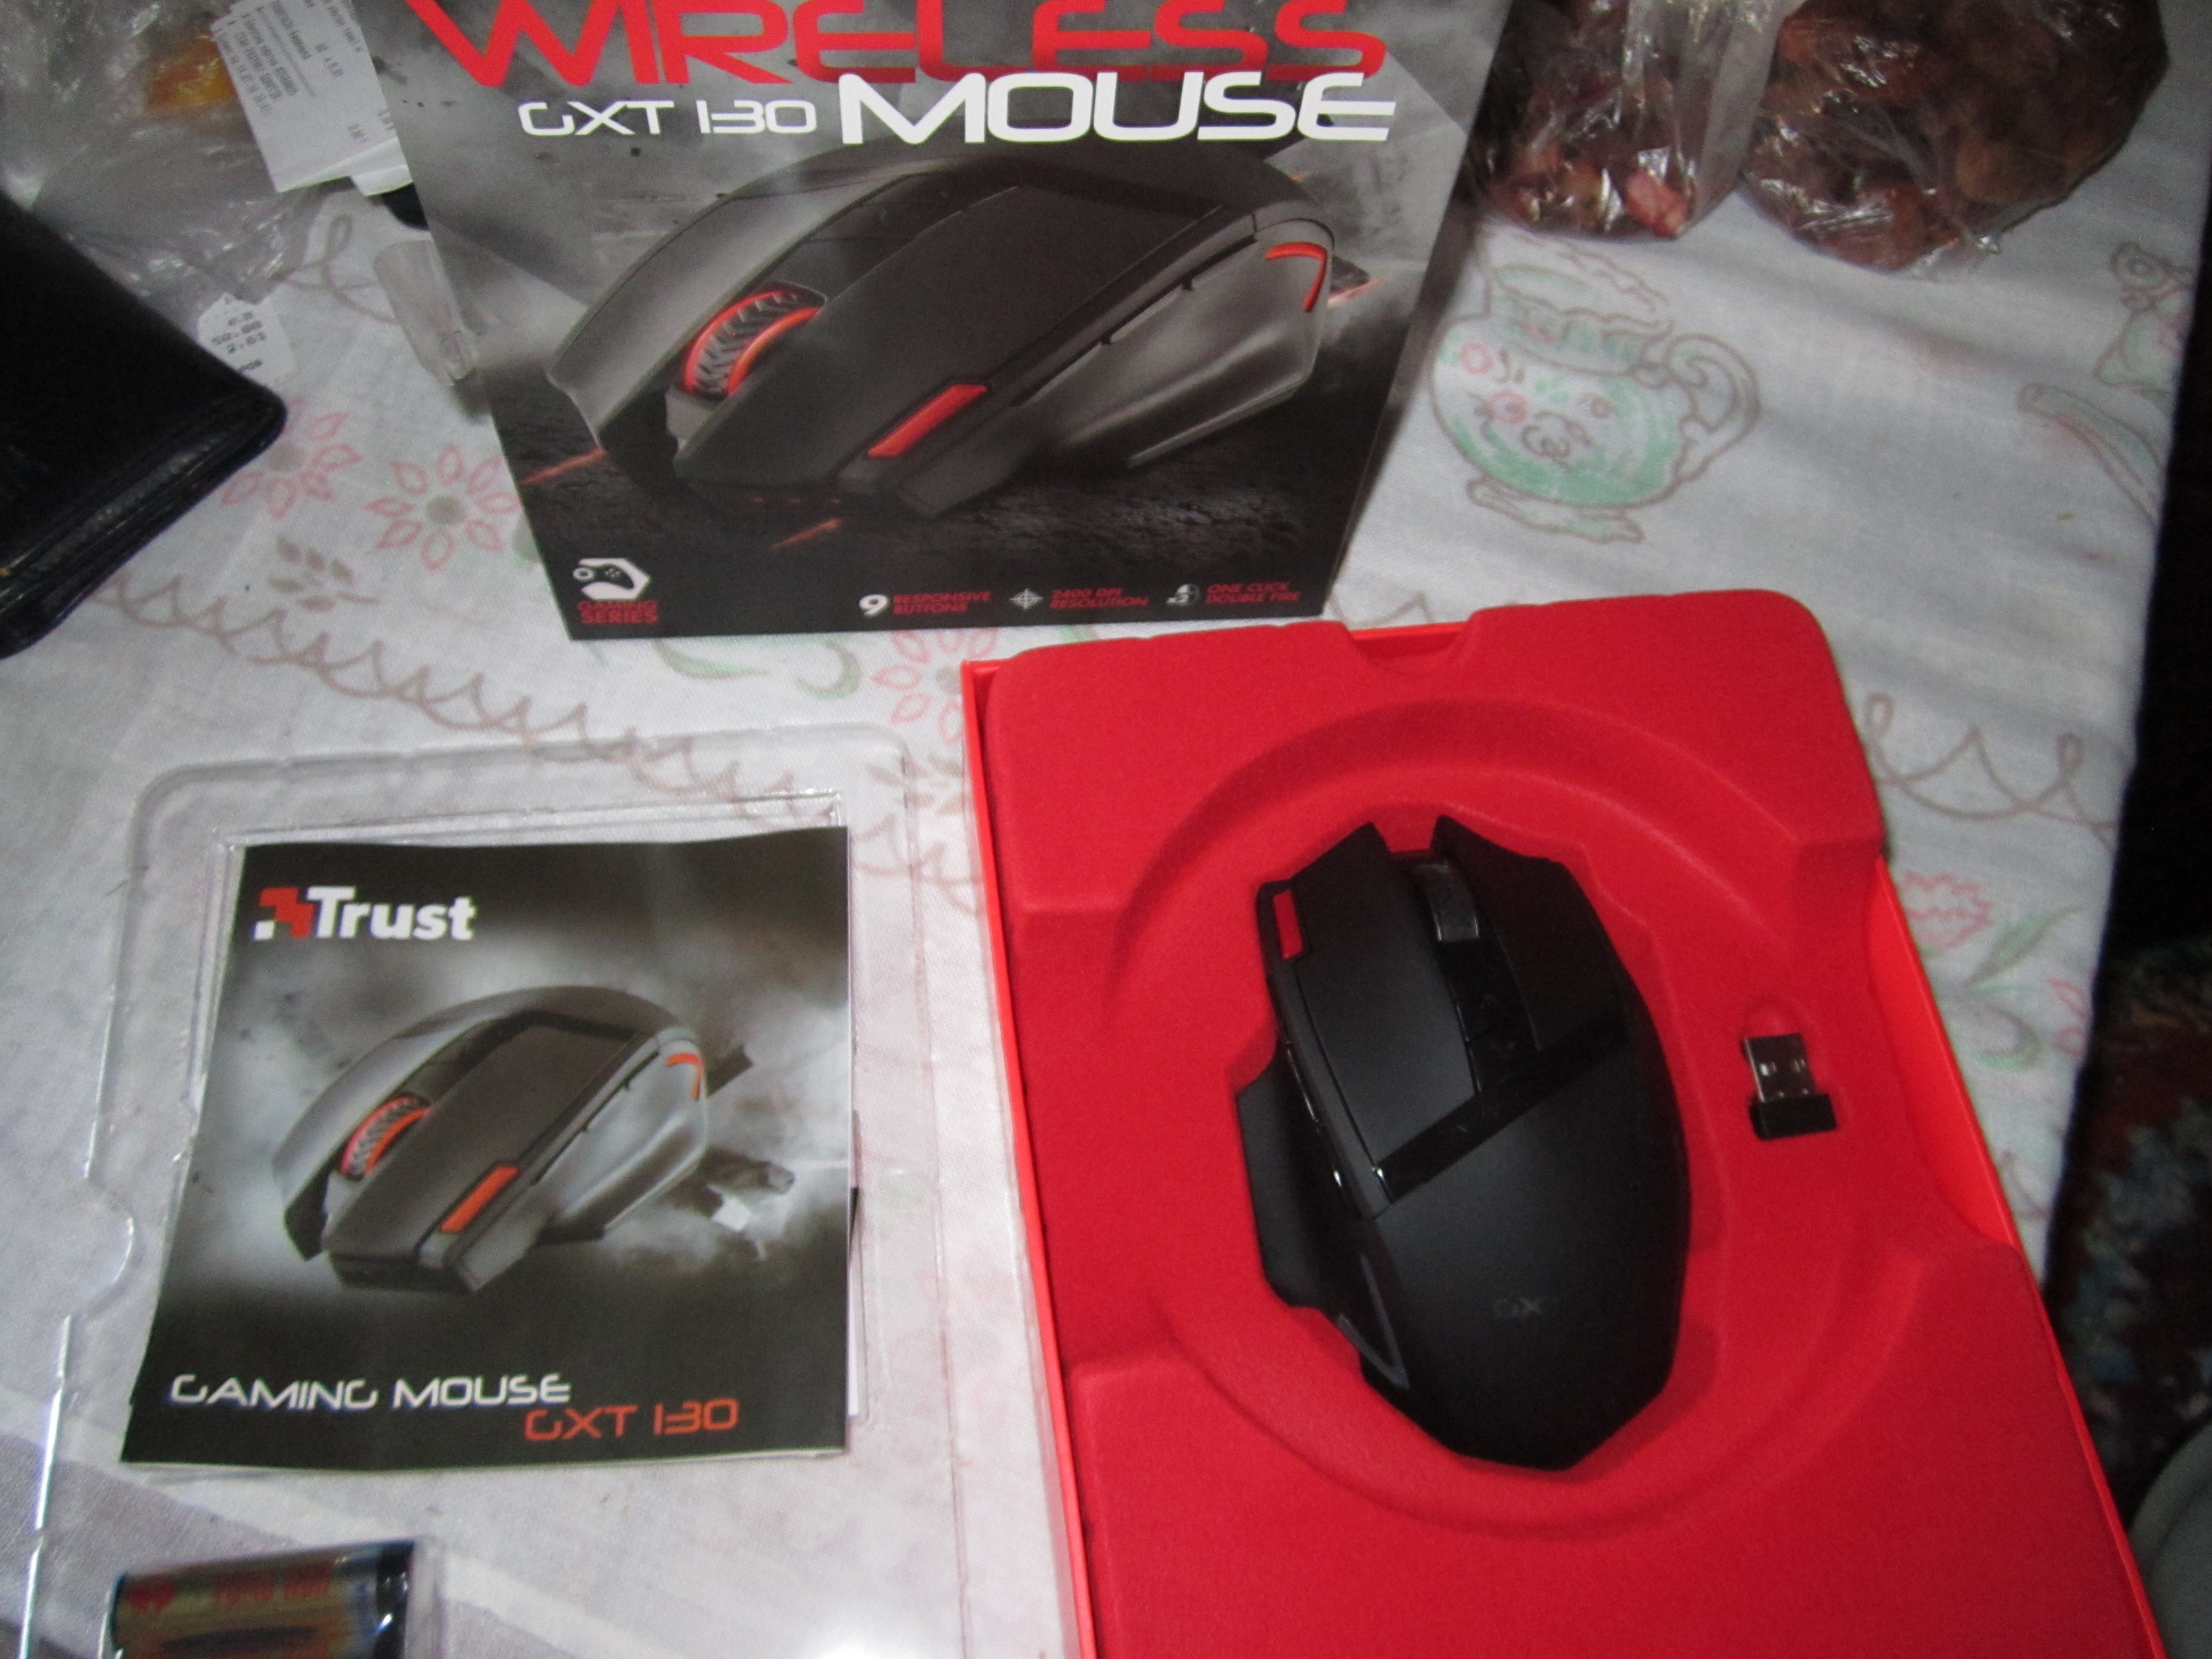 ef3954e29b3 Мышь Trust GXT 130 Wireless Gaming Mouse (20687) фотография 1 от  пользователя NGxWinGeR